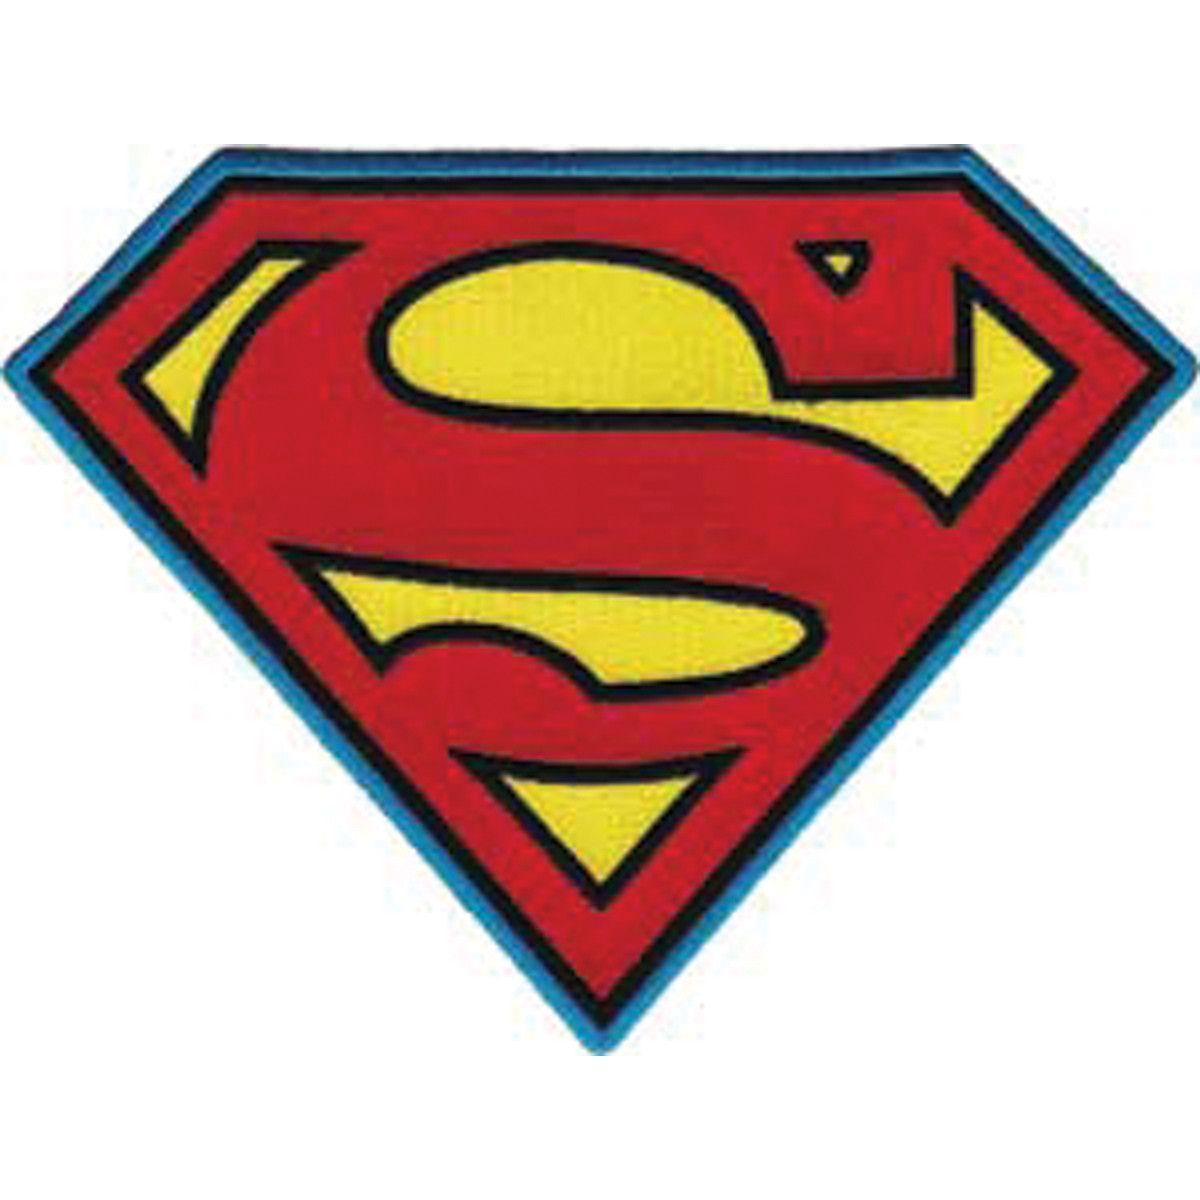 DC Comics Super Hero Patches Superman Insignia | Malen